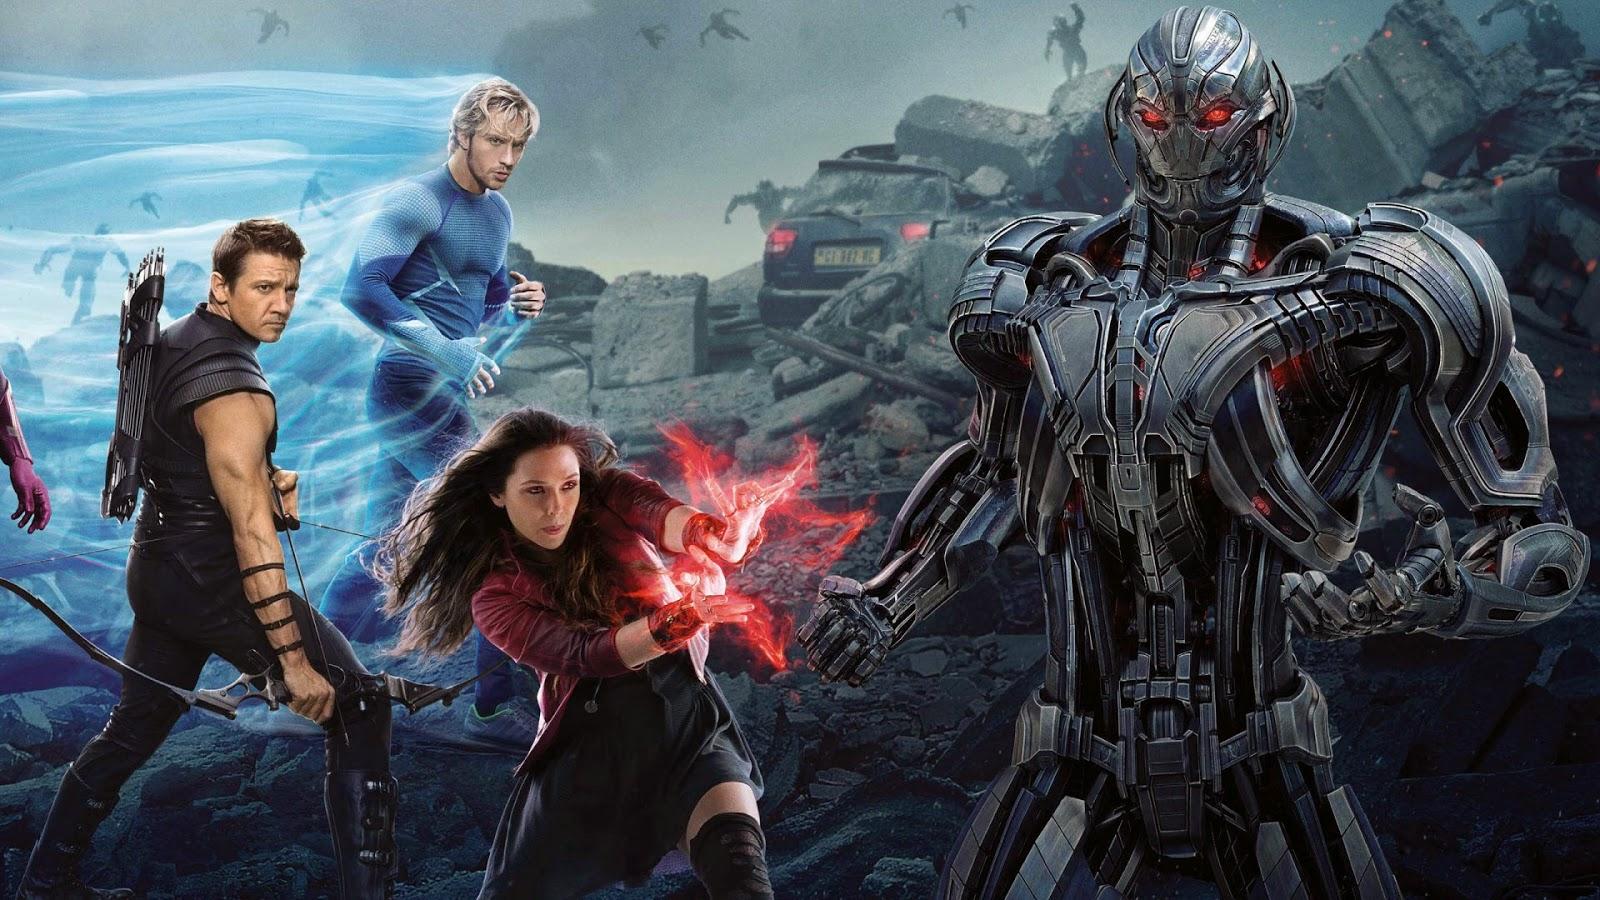 Papel de Parede Filme Vingadores Era de Ultron para pc hd 3d grátis Movie wallpaper hd free